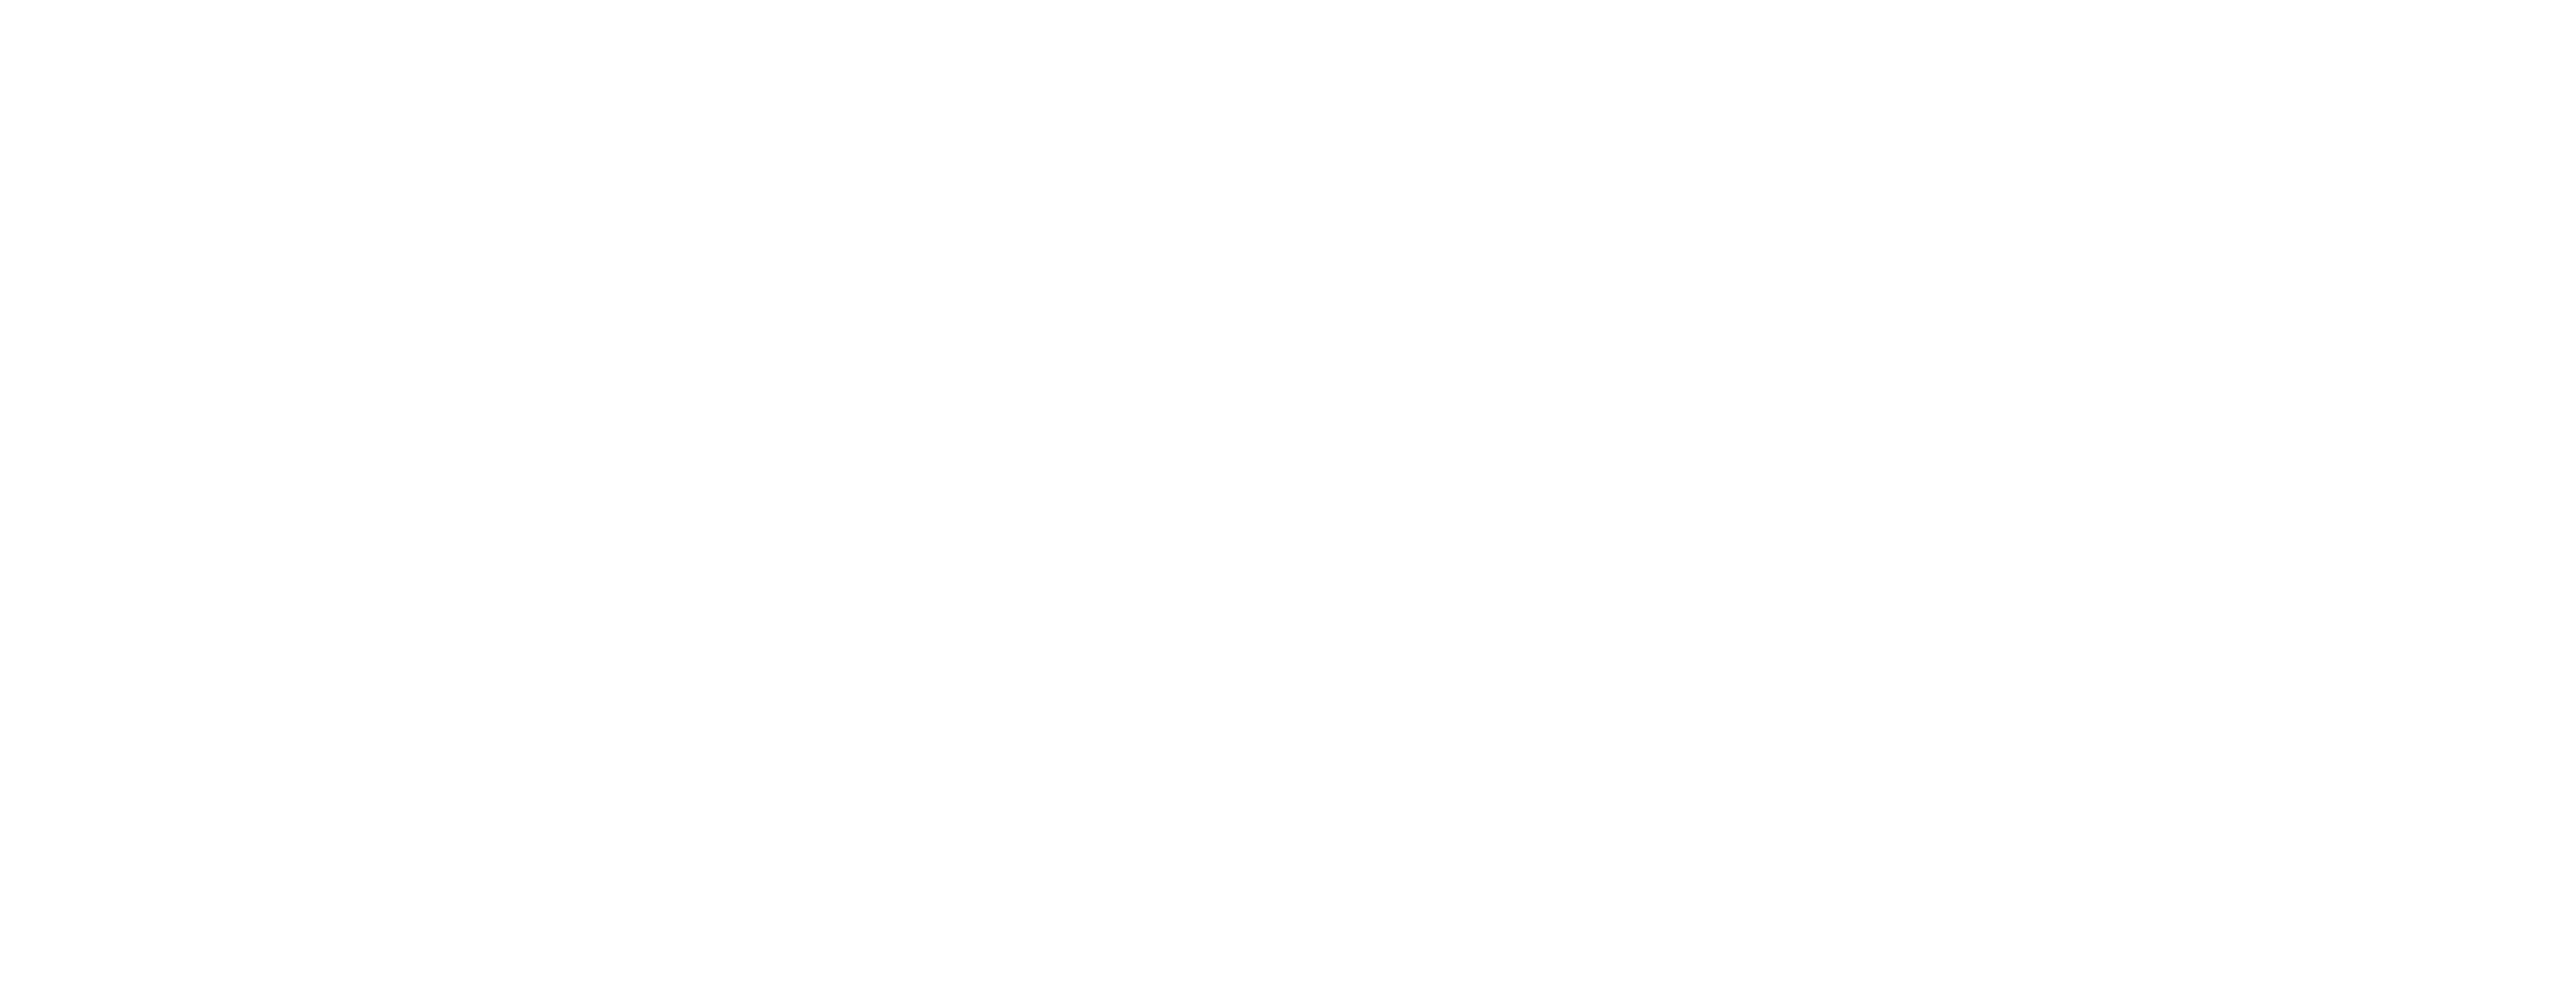 Variant – Tip Trailer – 1315 T2 (392x150x102 cm)